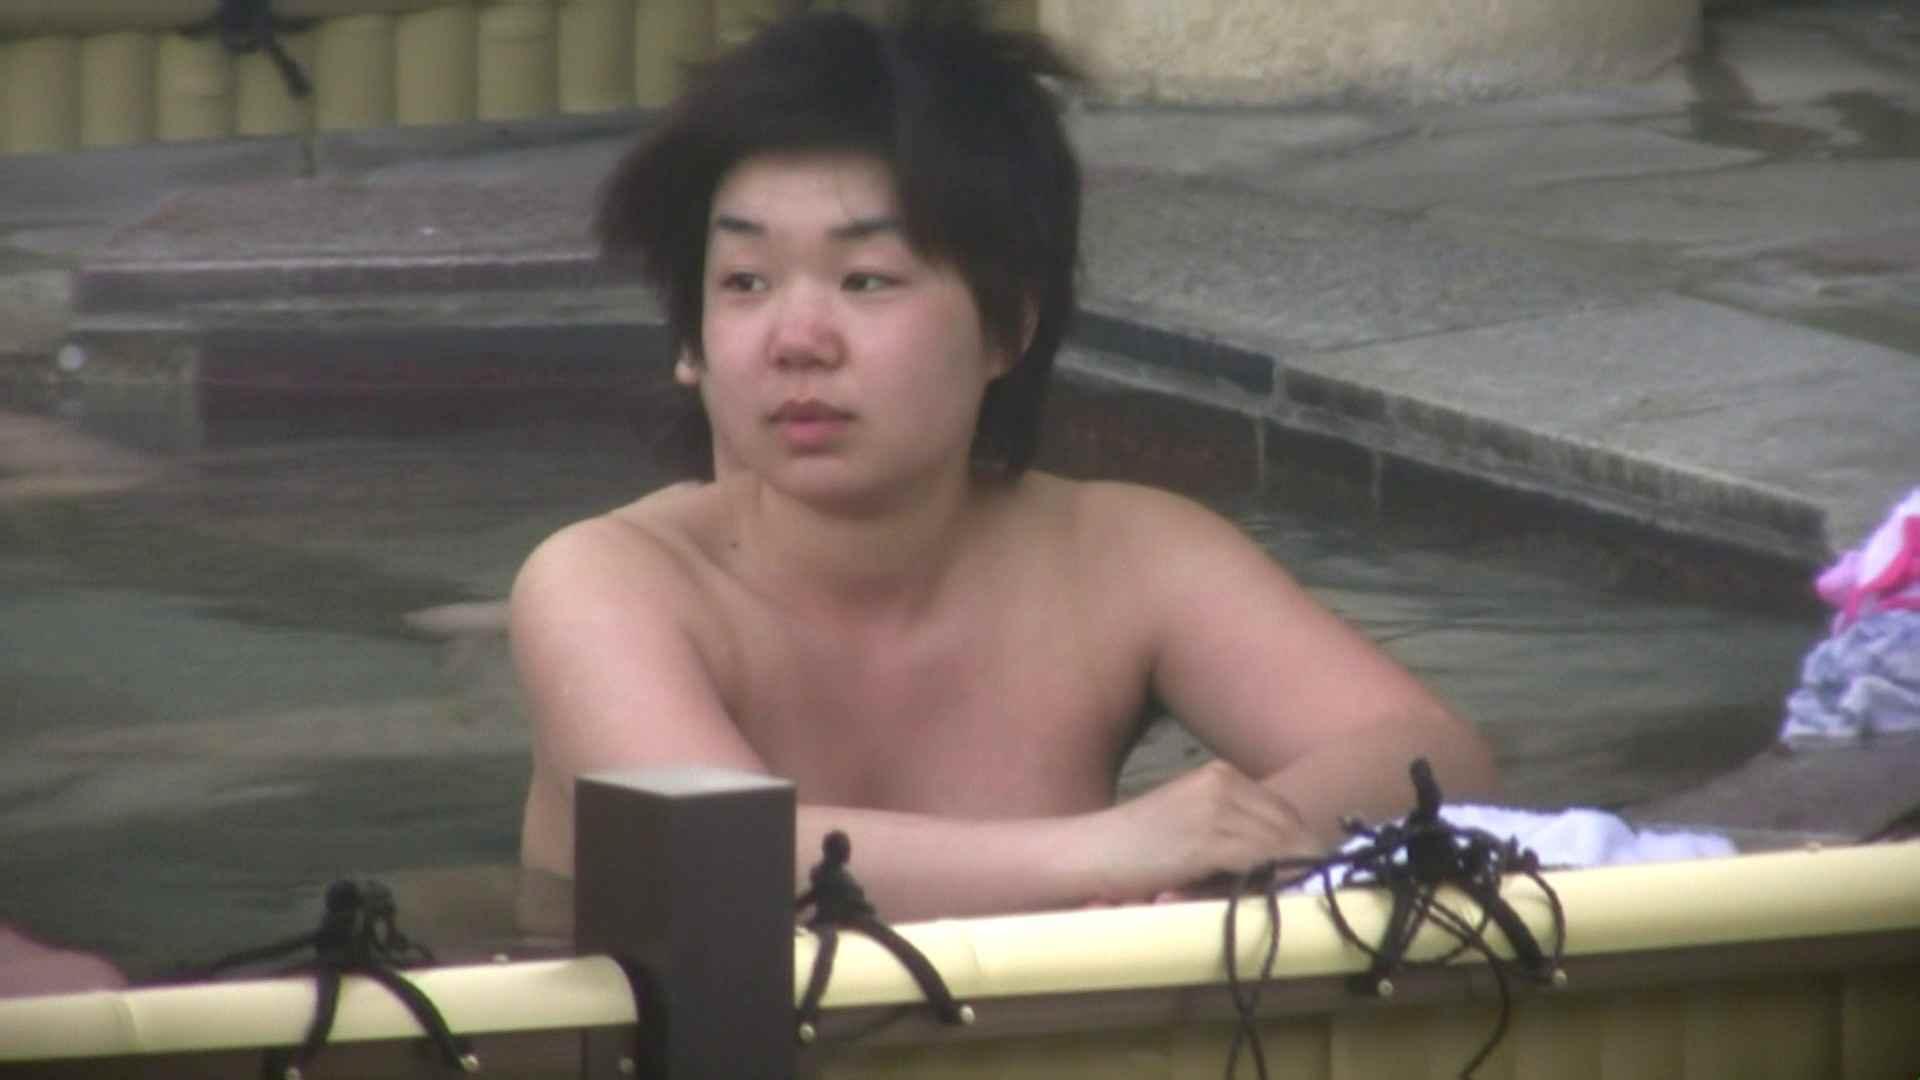 Aquaな露天風呂Vol.53【VIP限定】 女体盗撮 | OL女体  93連発 1